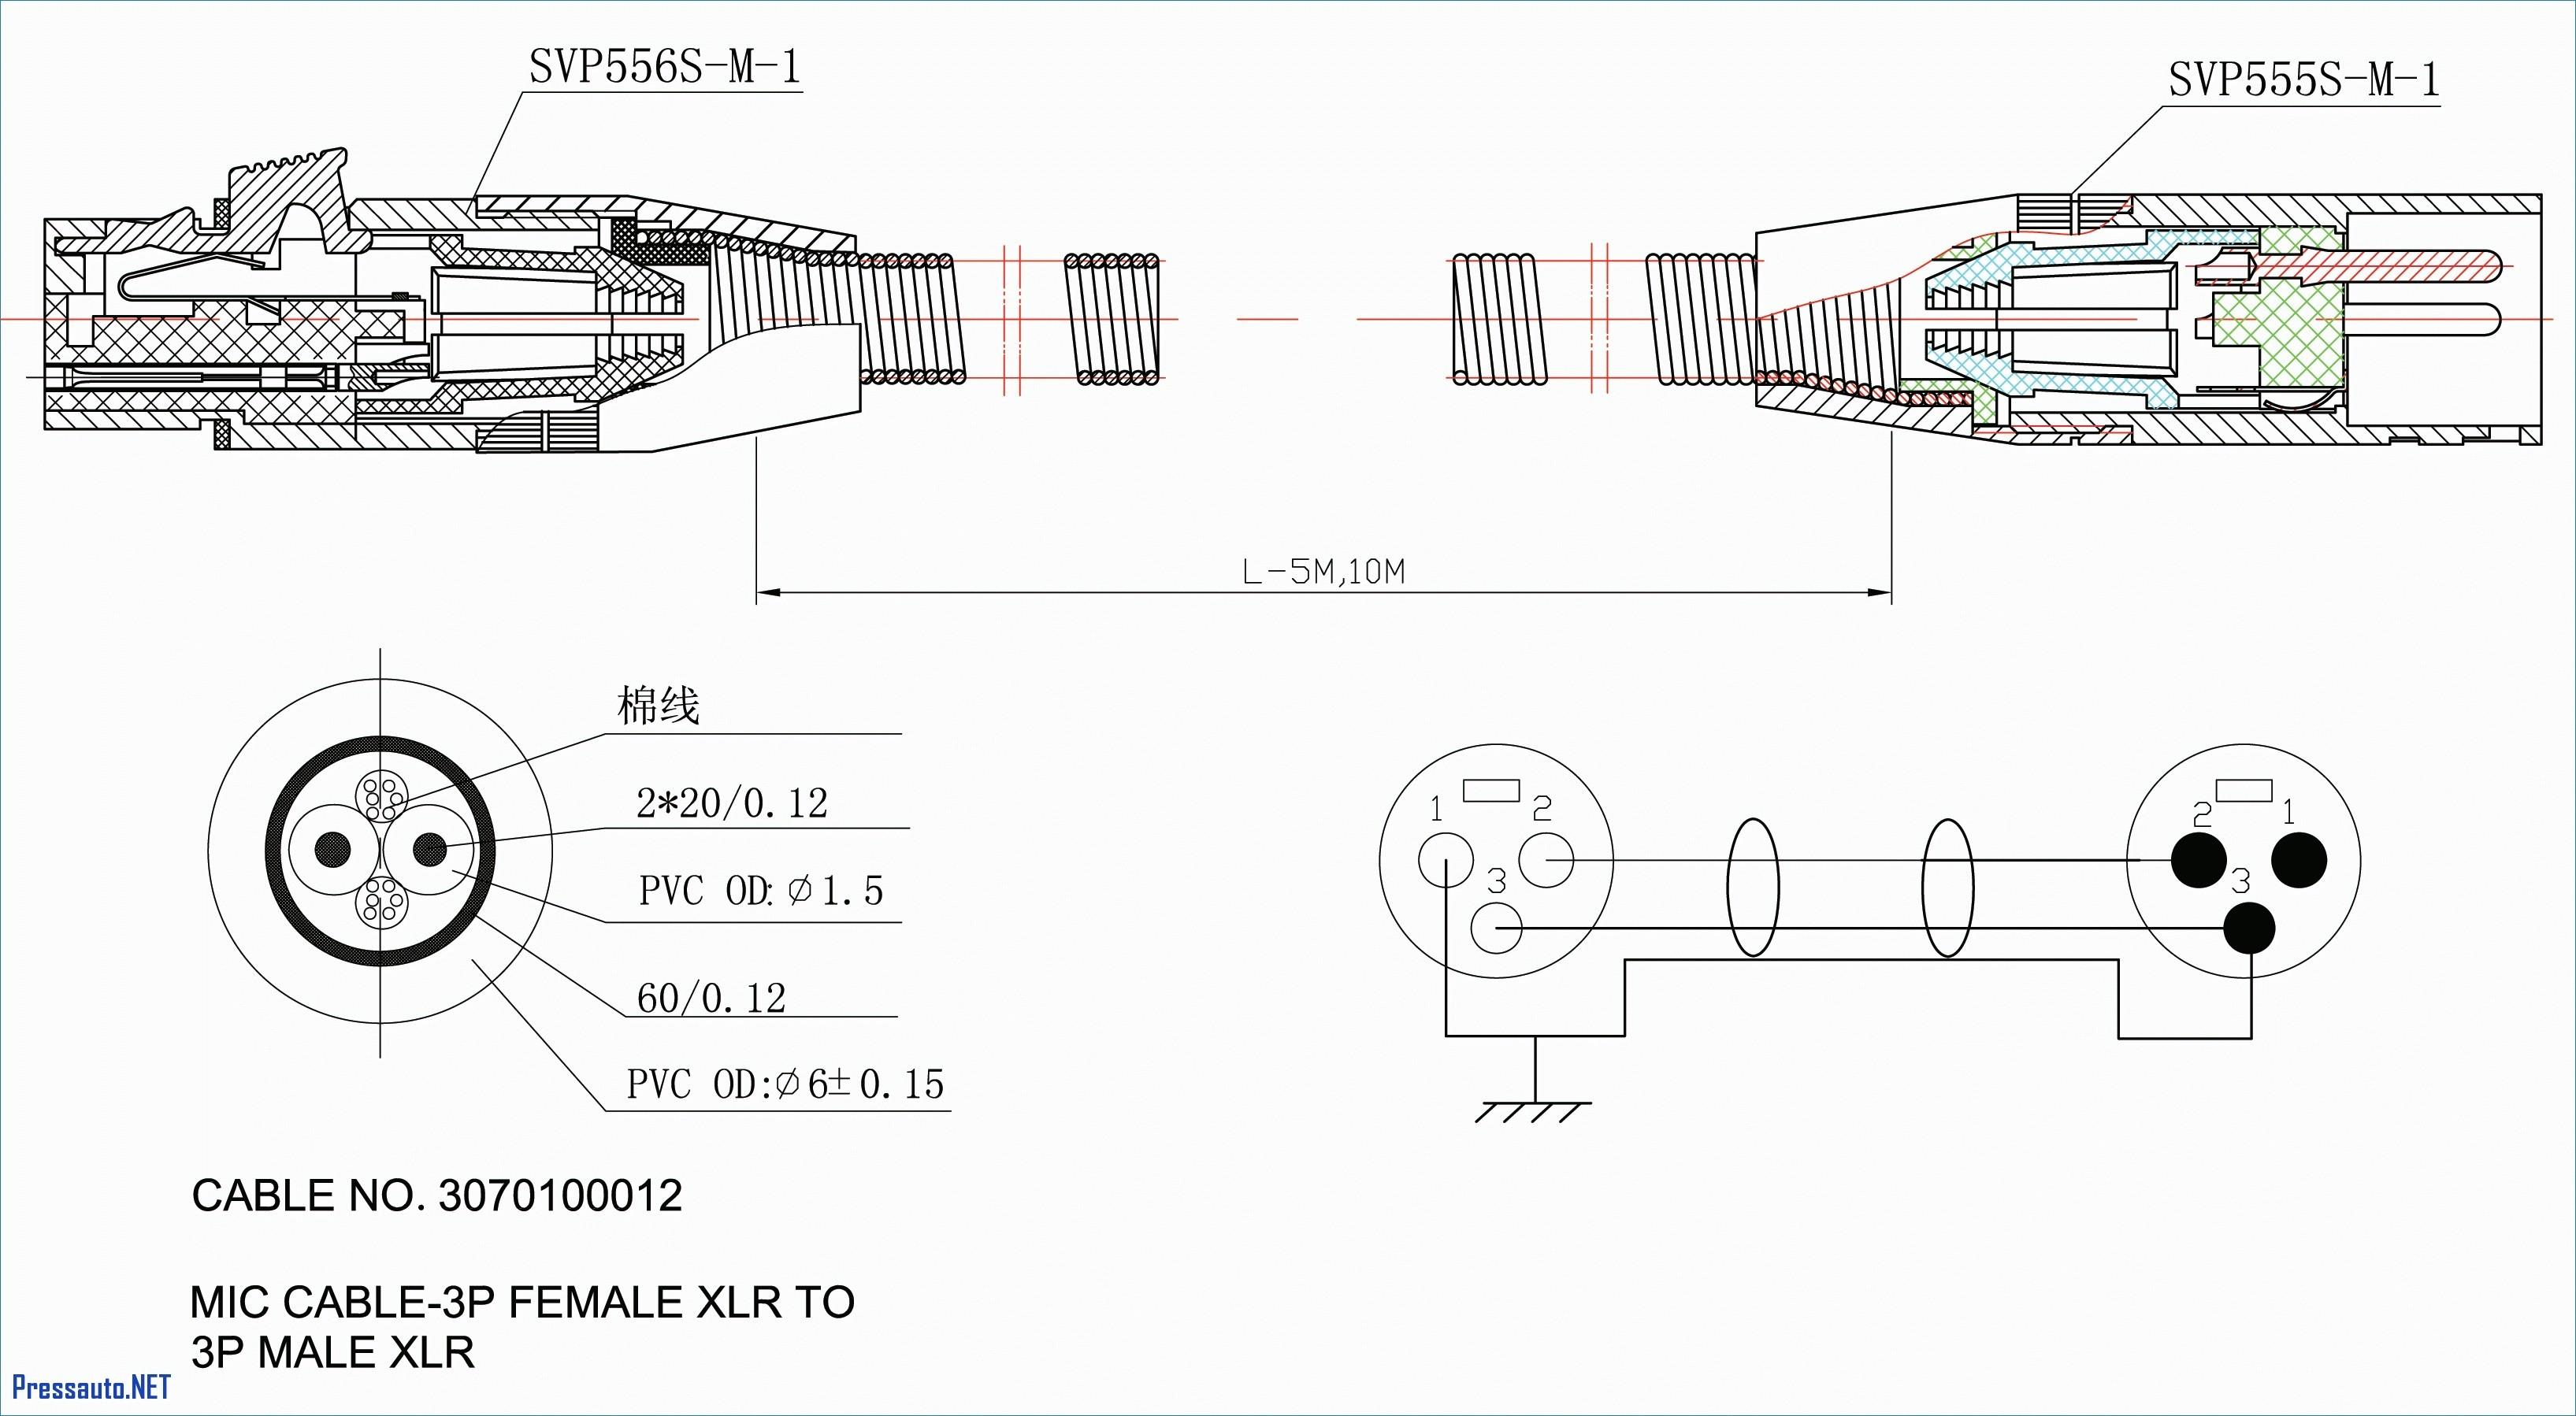 2002 Vw Jetta Engine Diagram Vw Tdi Engine Diagram Another Blog About Wiring Diagram • Of 2002 Vw Jetta Engine Diagram